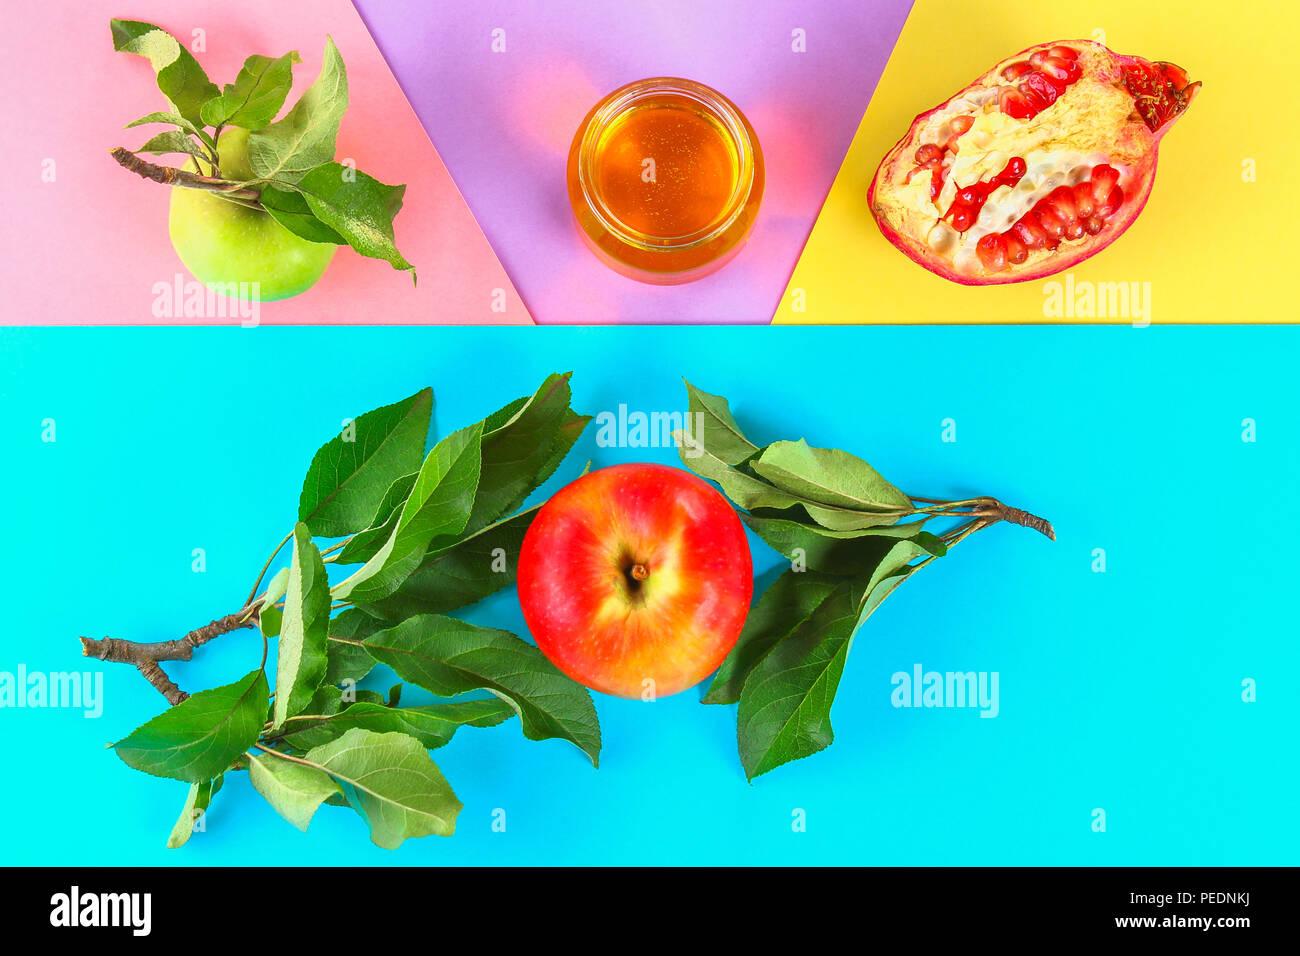 Pomegranate Jewish Symbol Stock Photos Pomegranate Jewish Symbol